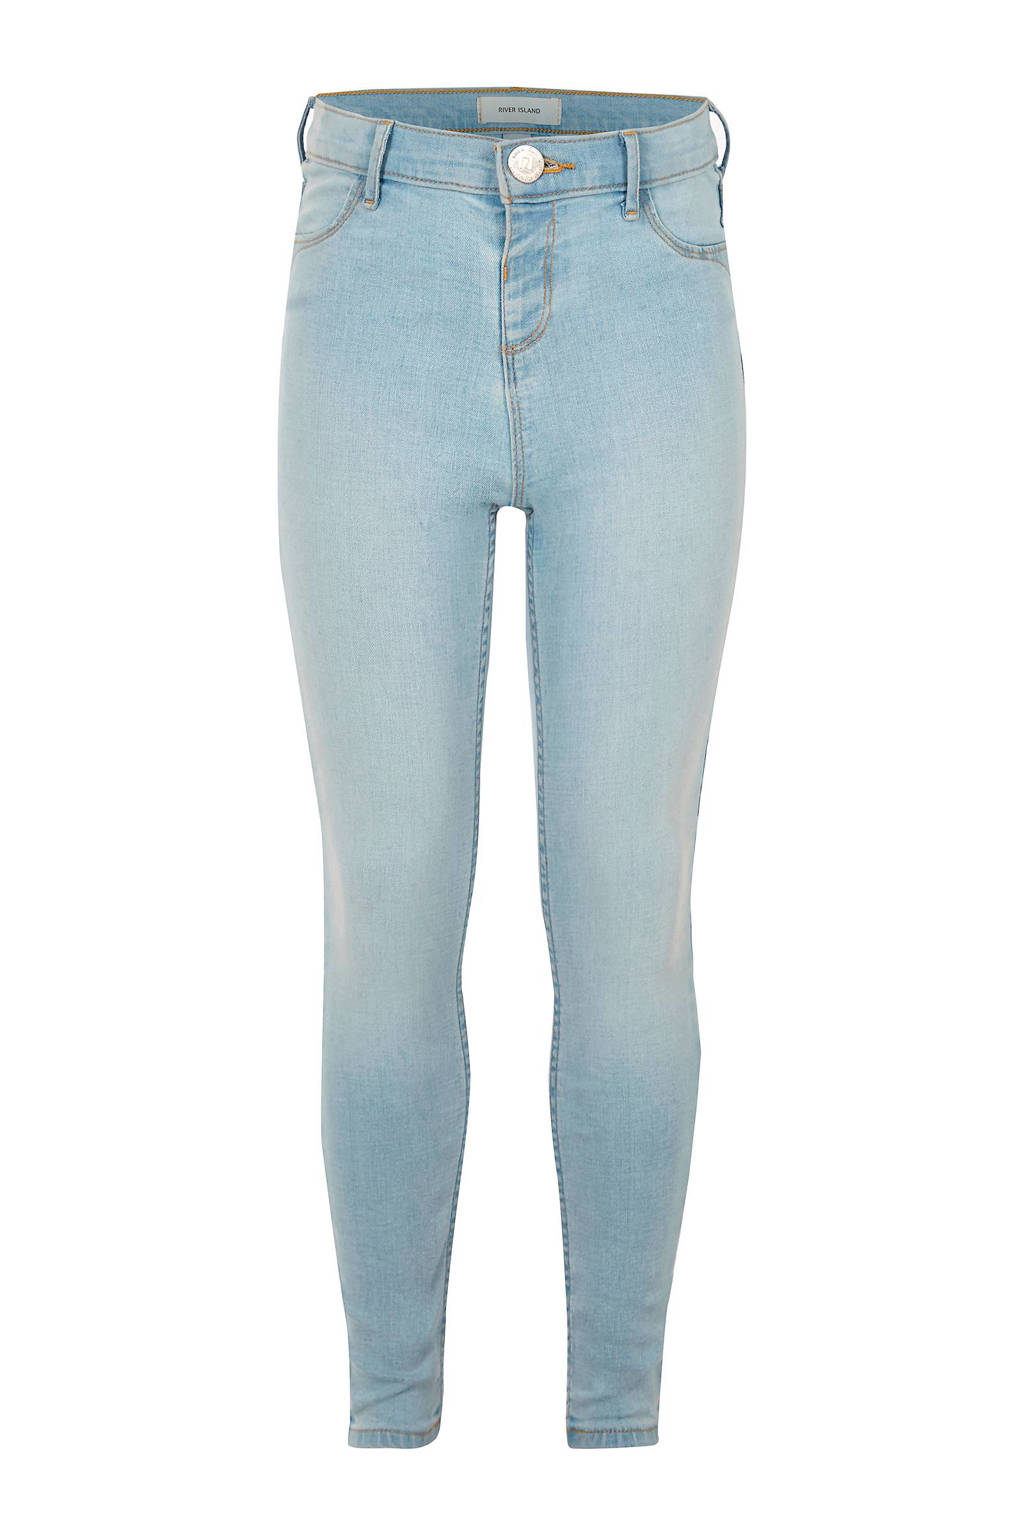 River Island denim jeans Molly, Lichtblauw